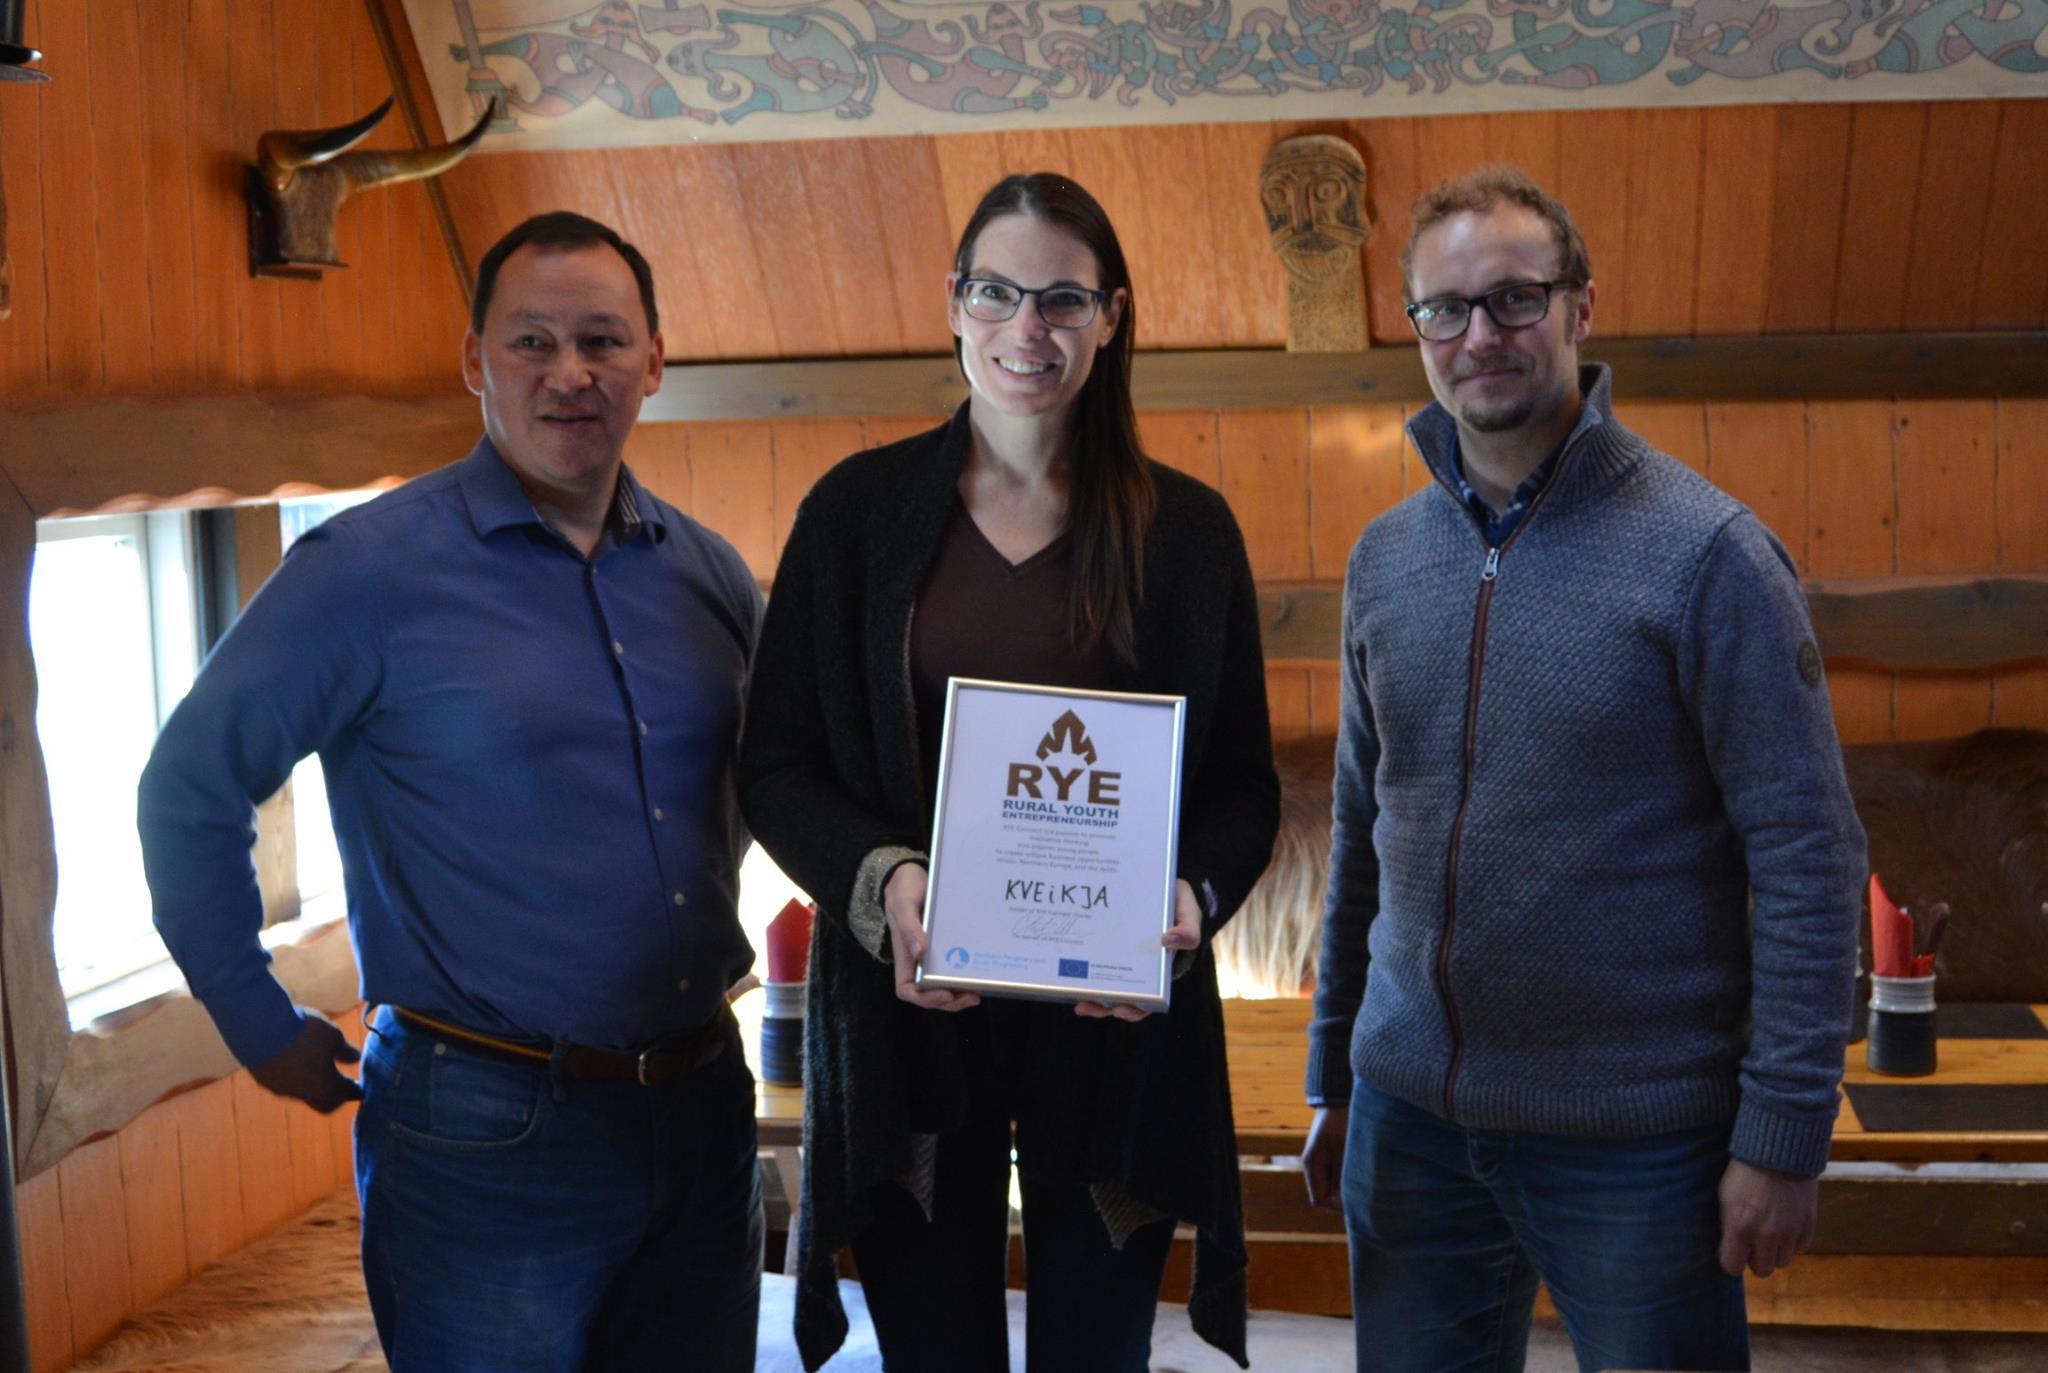 Delivering RYE Charter to Kveikja